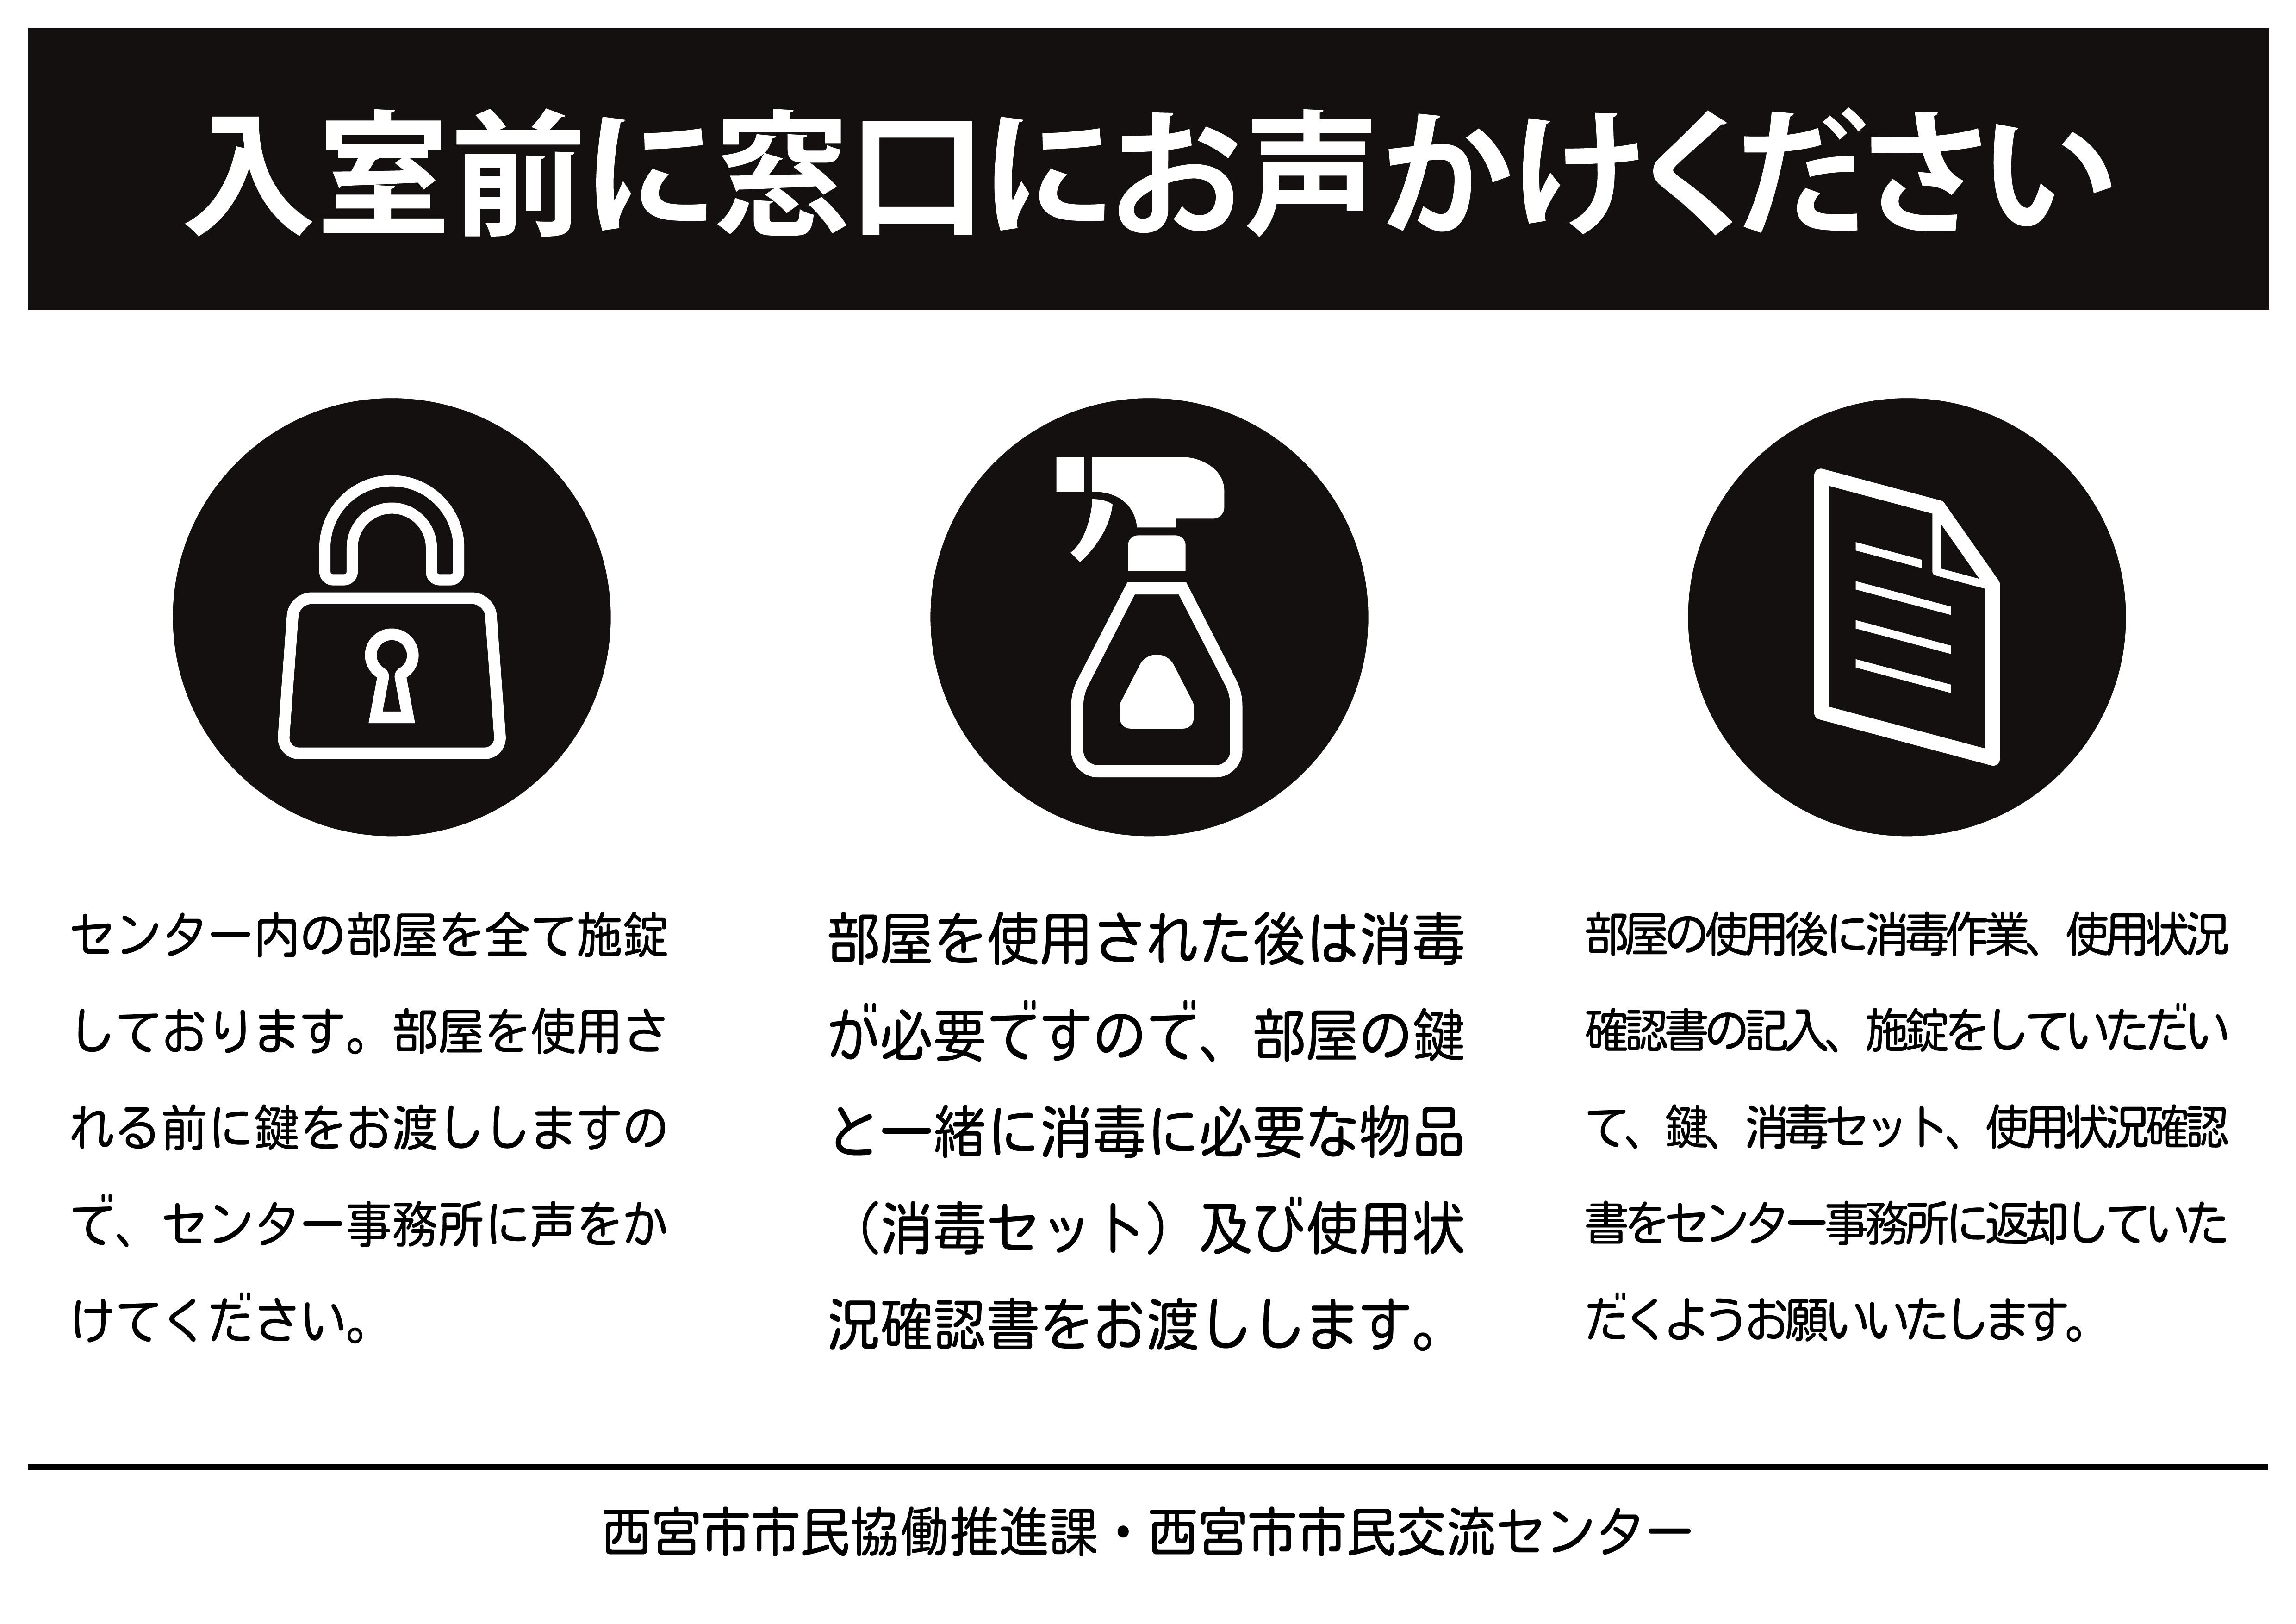 使用状況確認書と鍵手渡の受渡掲示